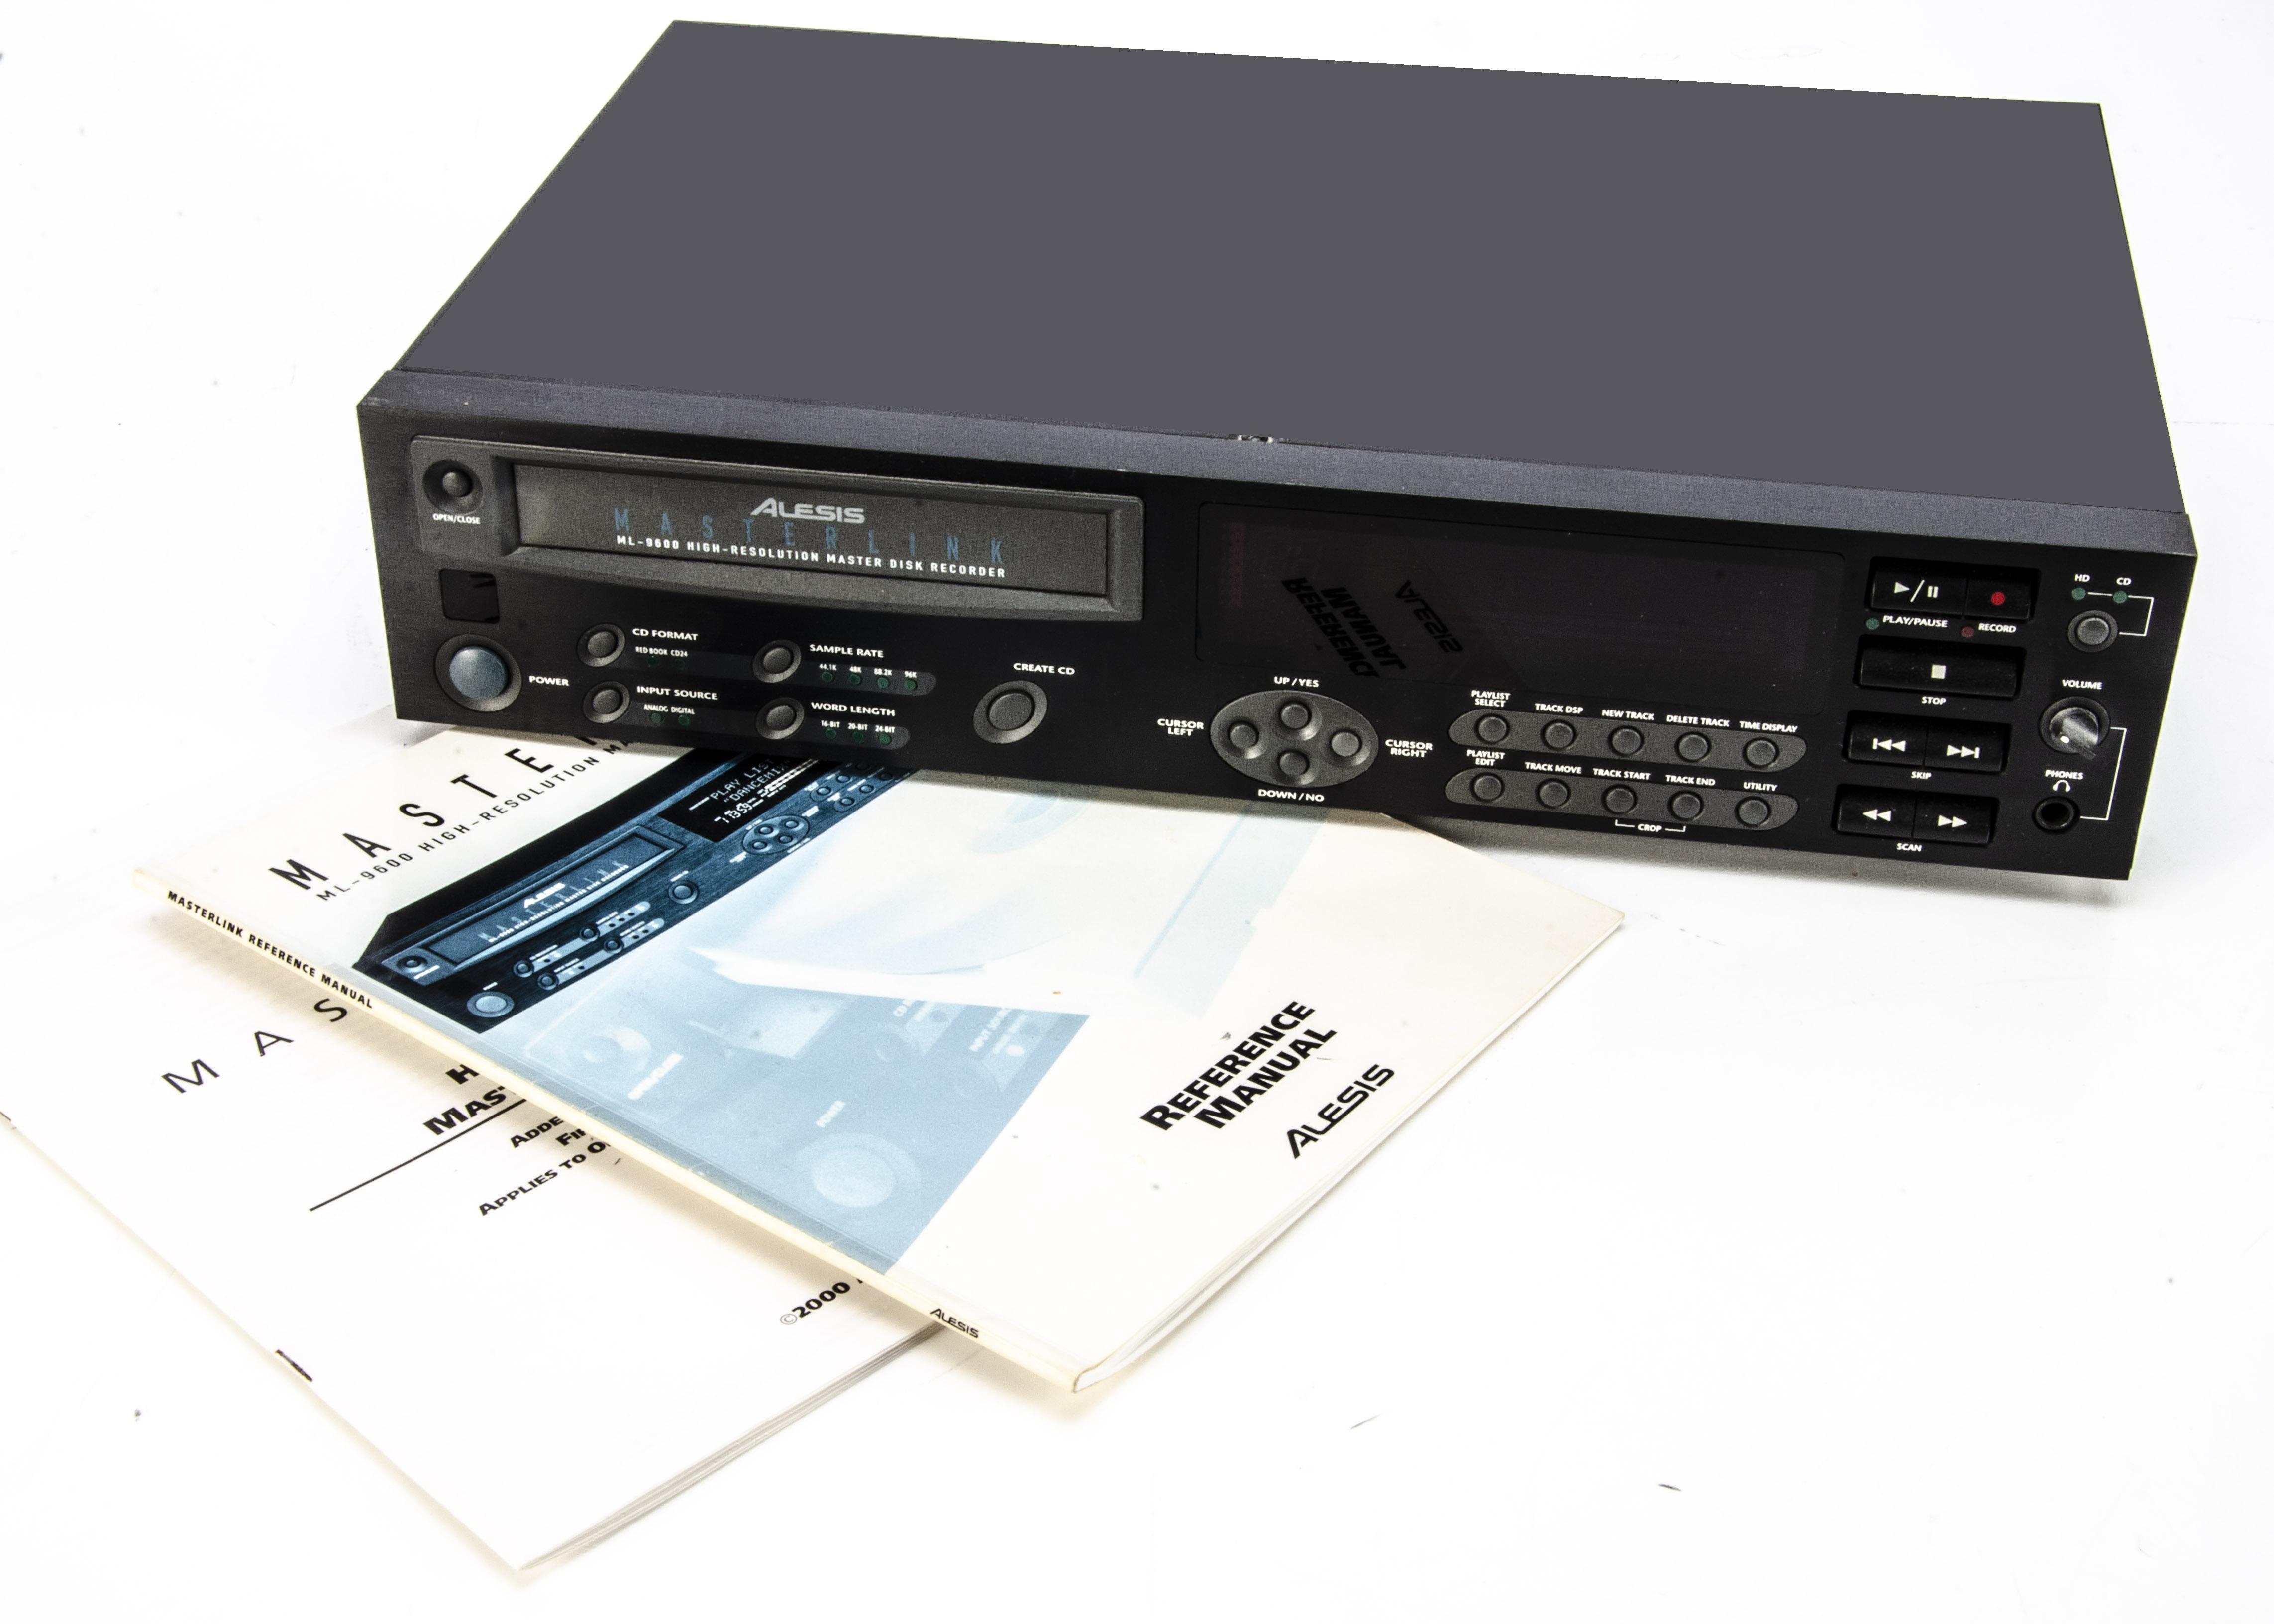 Alesis Disk Recorder, an Alesis ML-9600 high resolution digital CD Master Recorder, remote, boxed,